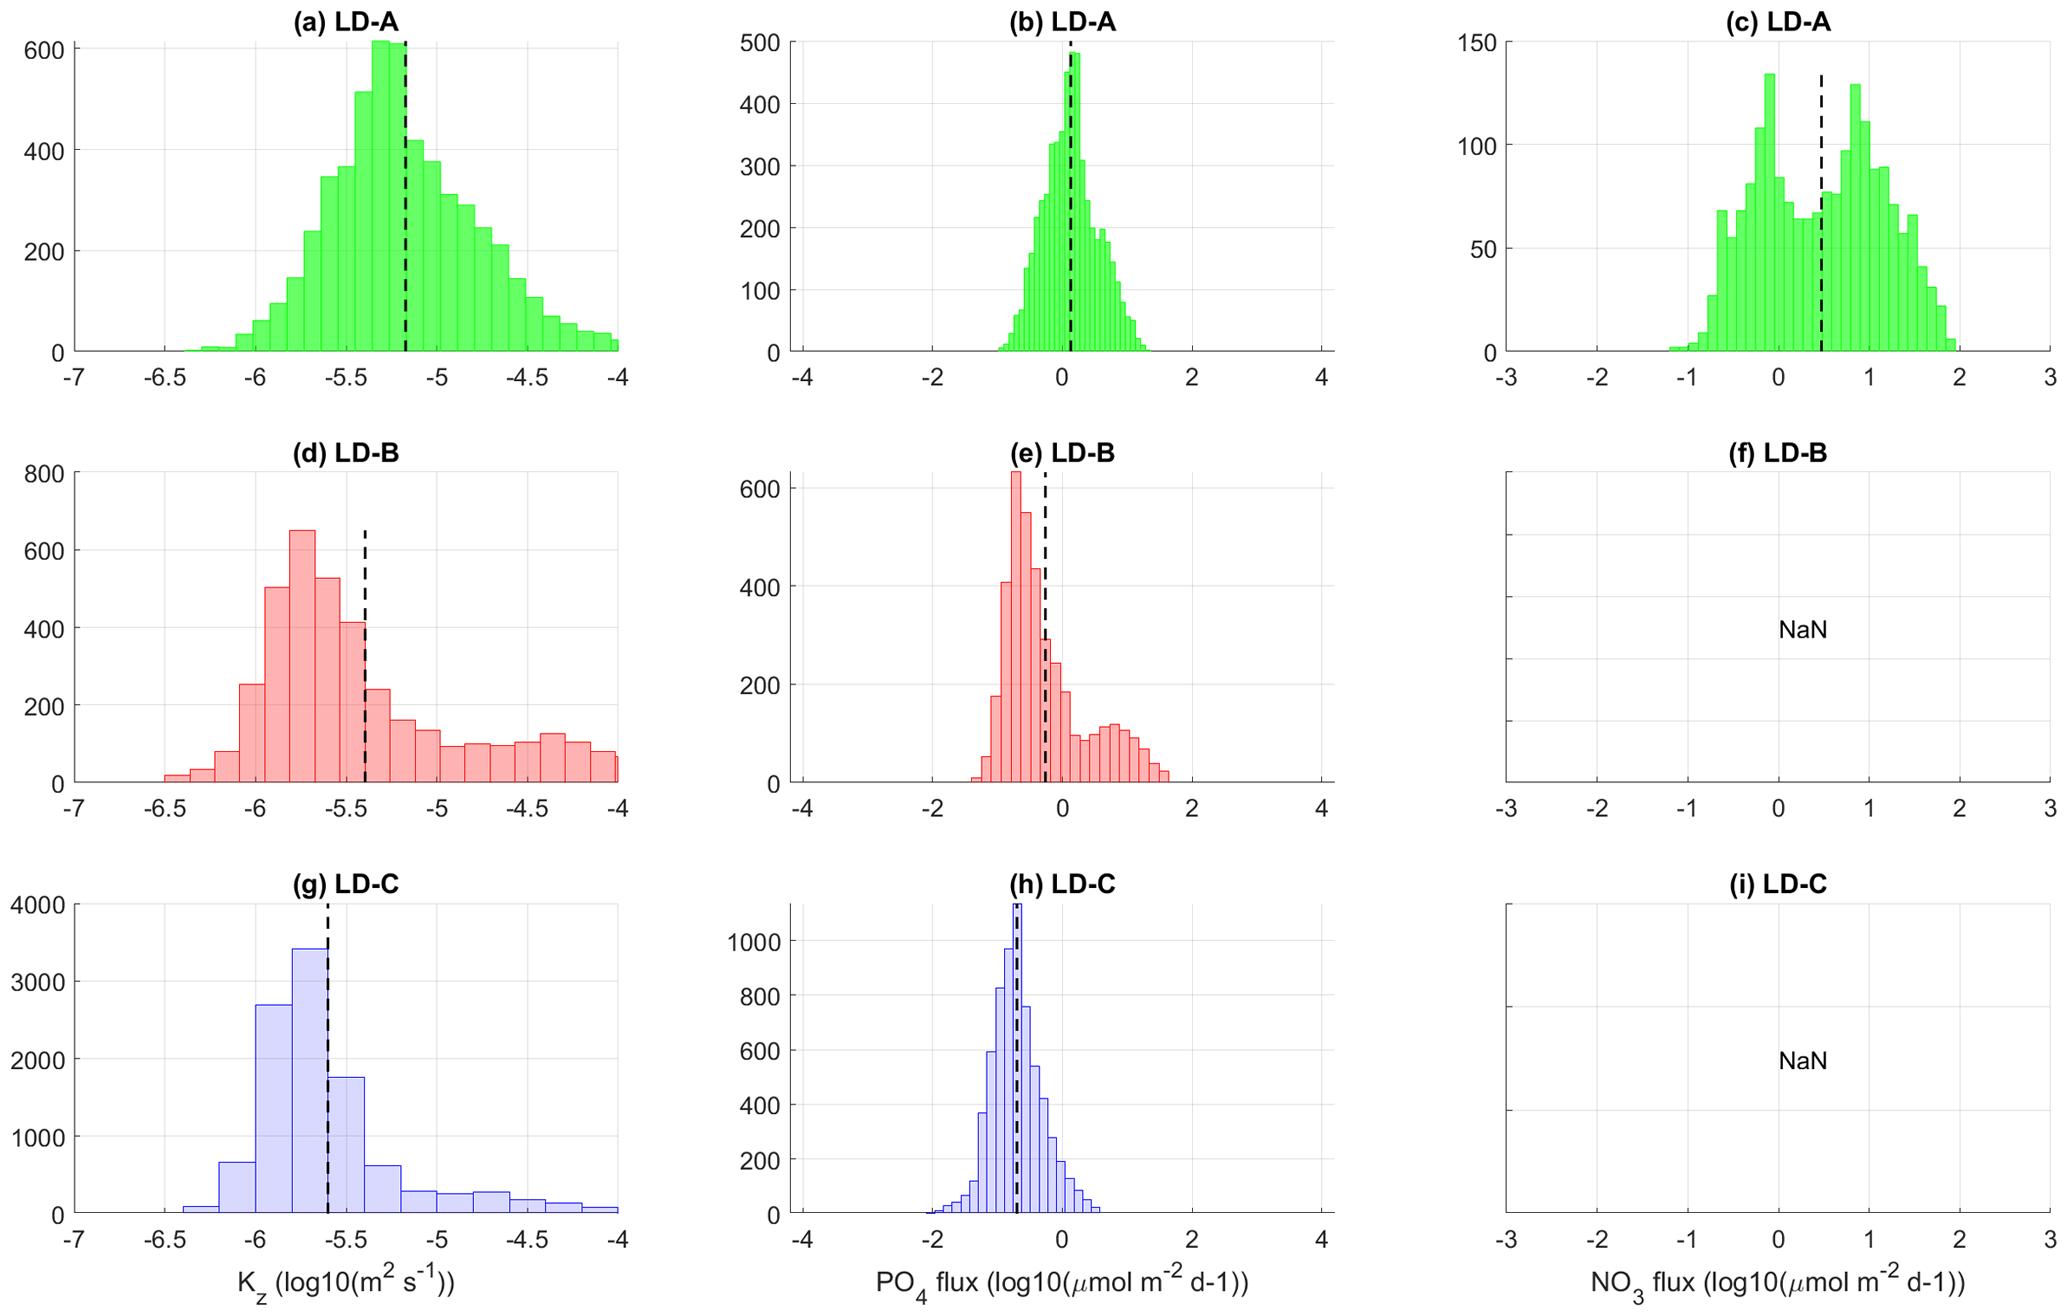 BG - Longitudinal contrast in turbulence along a ∼ 19° S